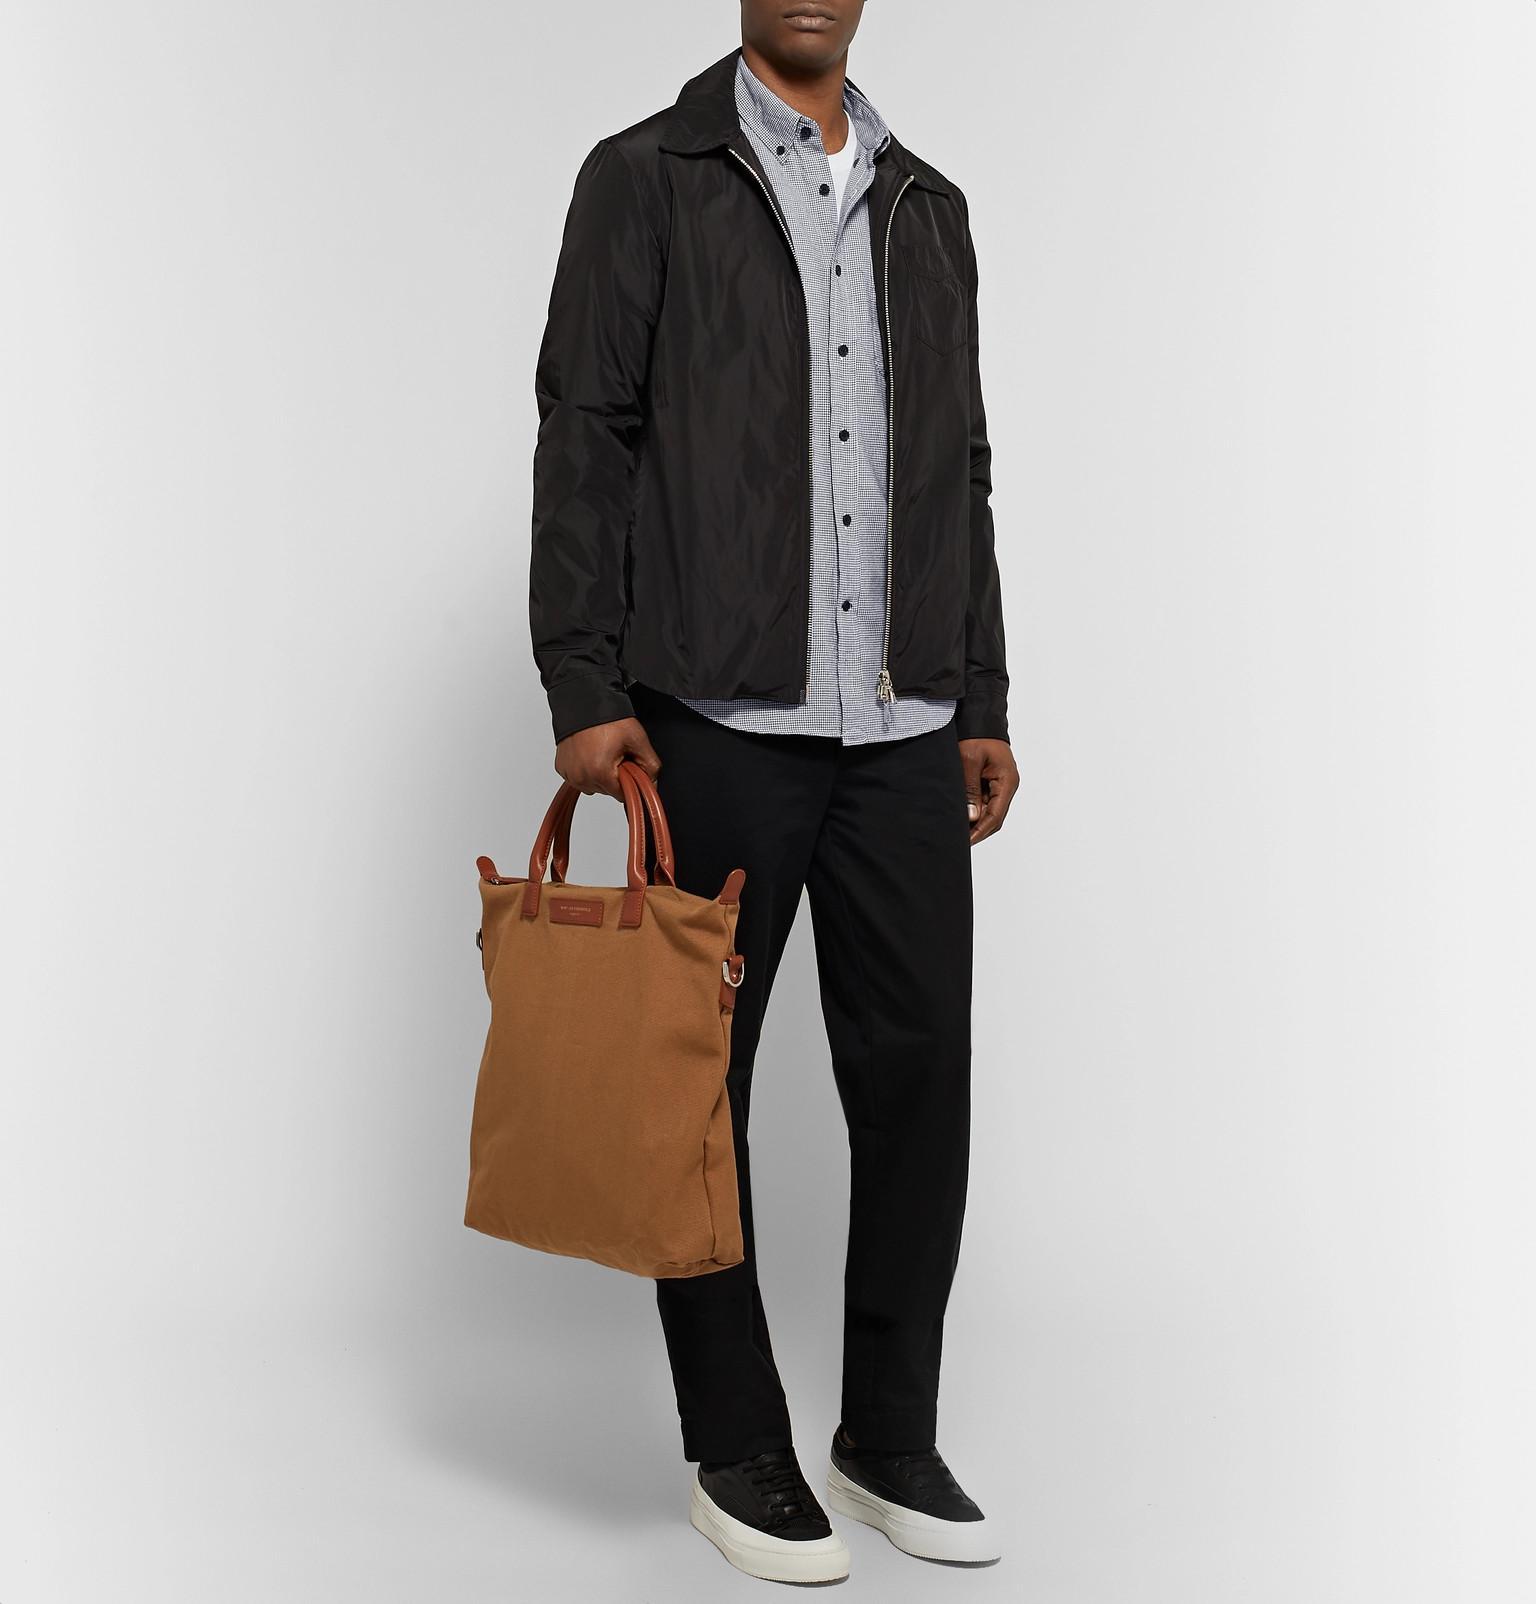 422a7fab2dd Club Monaco - Gray Button-down Collar Puppytooth Cotton-flannel Shirt for  Men -. View fullscreen